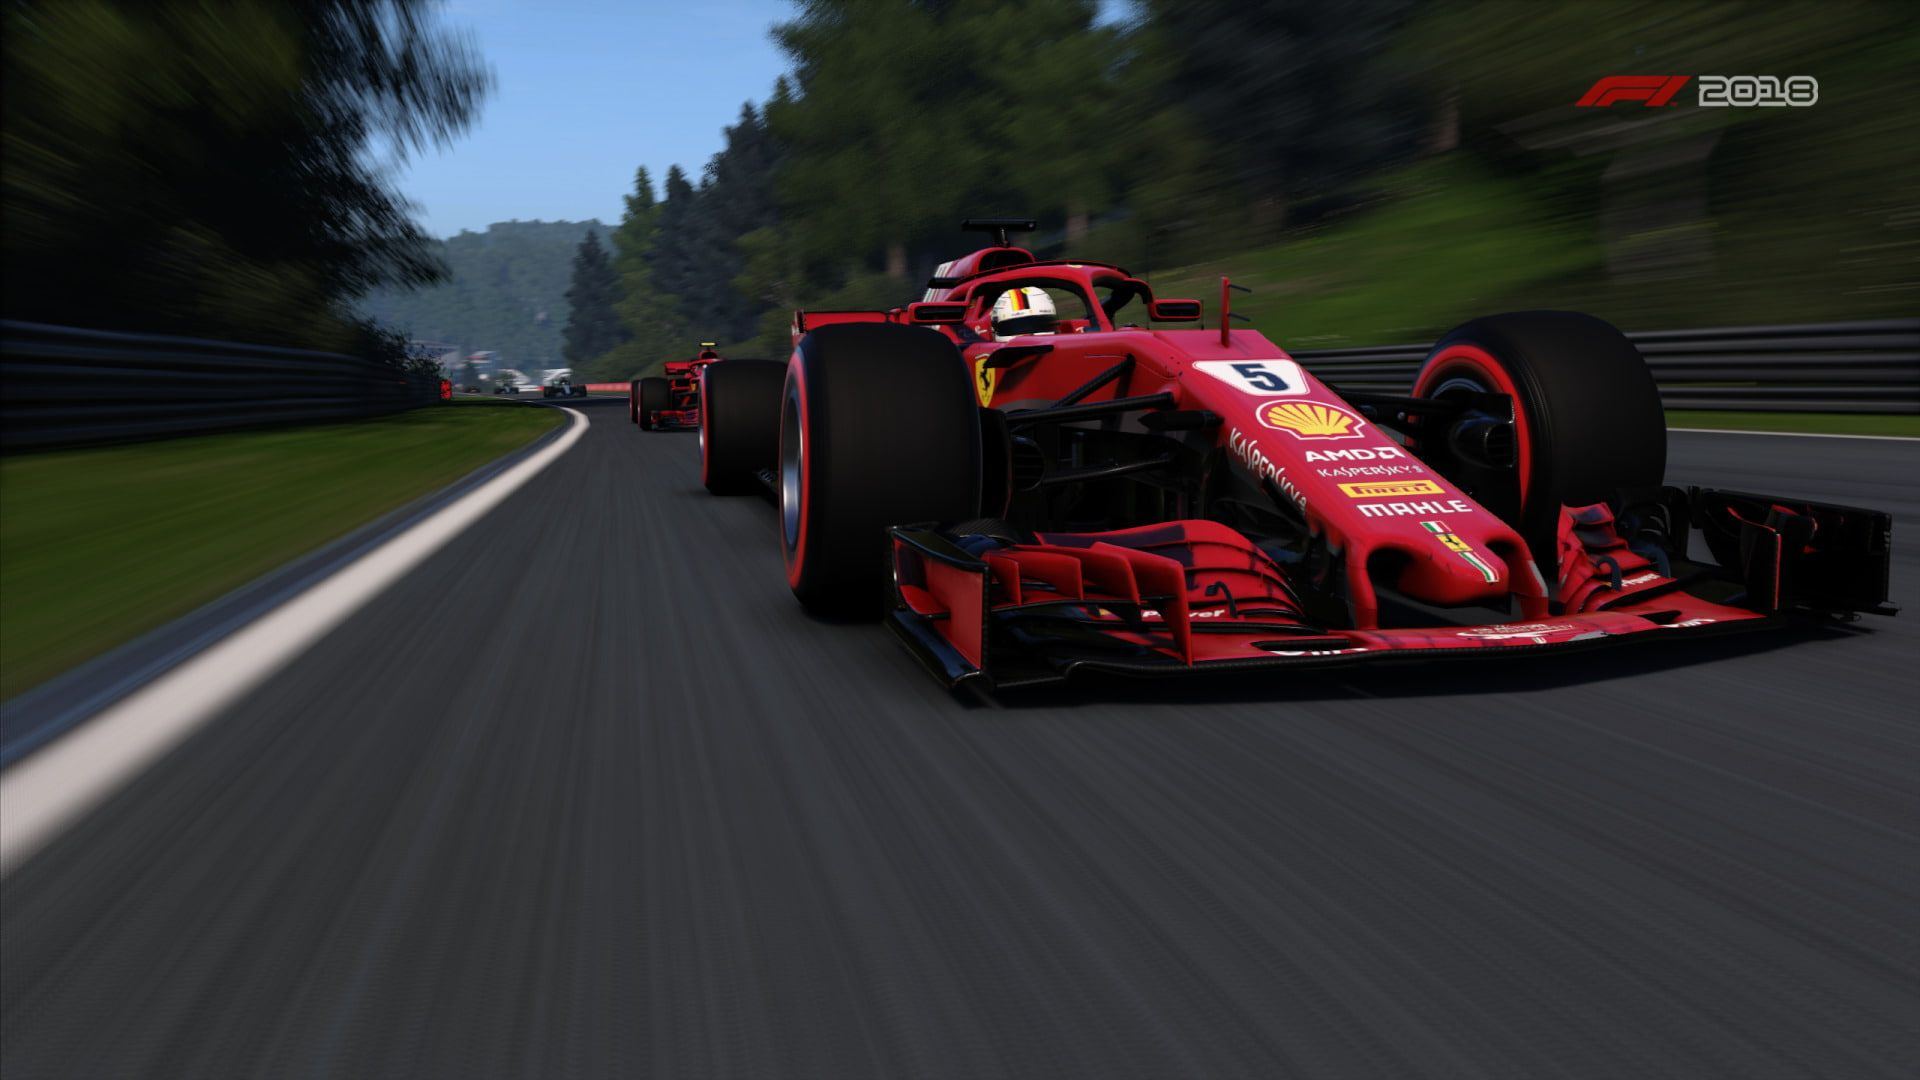 Video Game F1 2018 Ferrari Ferrari Sf71h Formula 1 Vehicle 1080p Wallpaper Hdwallpaper Desktop Ferrari Formula 1 1 Wallpaper